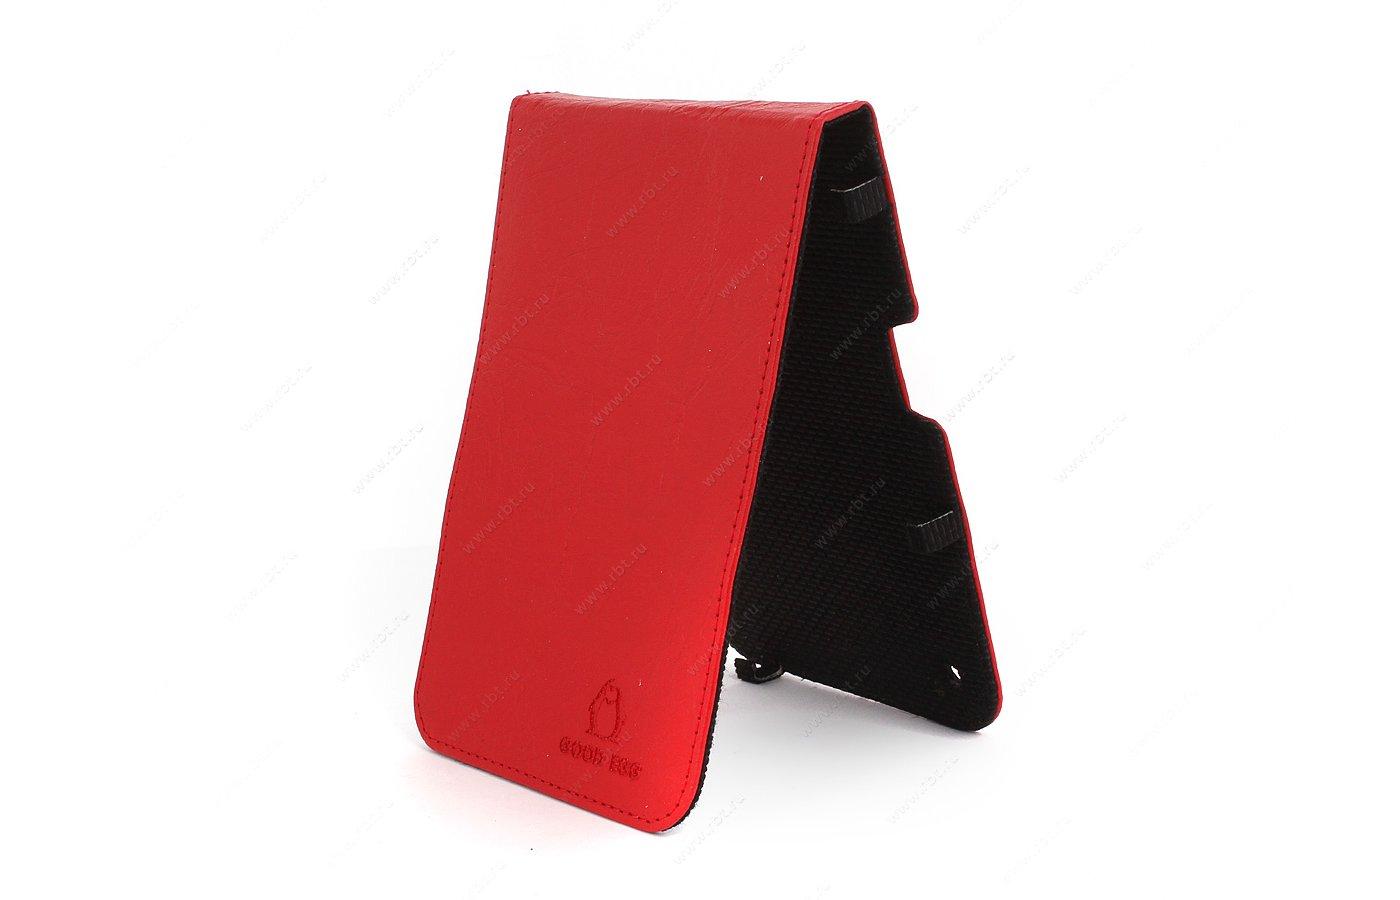 Чехол GoodEgg для PocketBook 650 кожа красный (GE-PB650LIR2210)